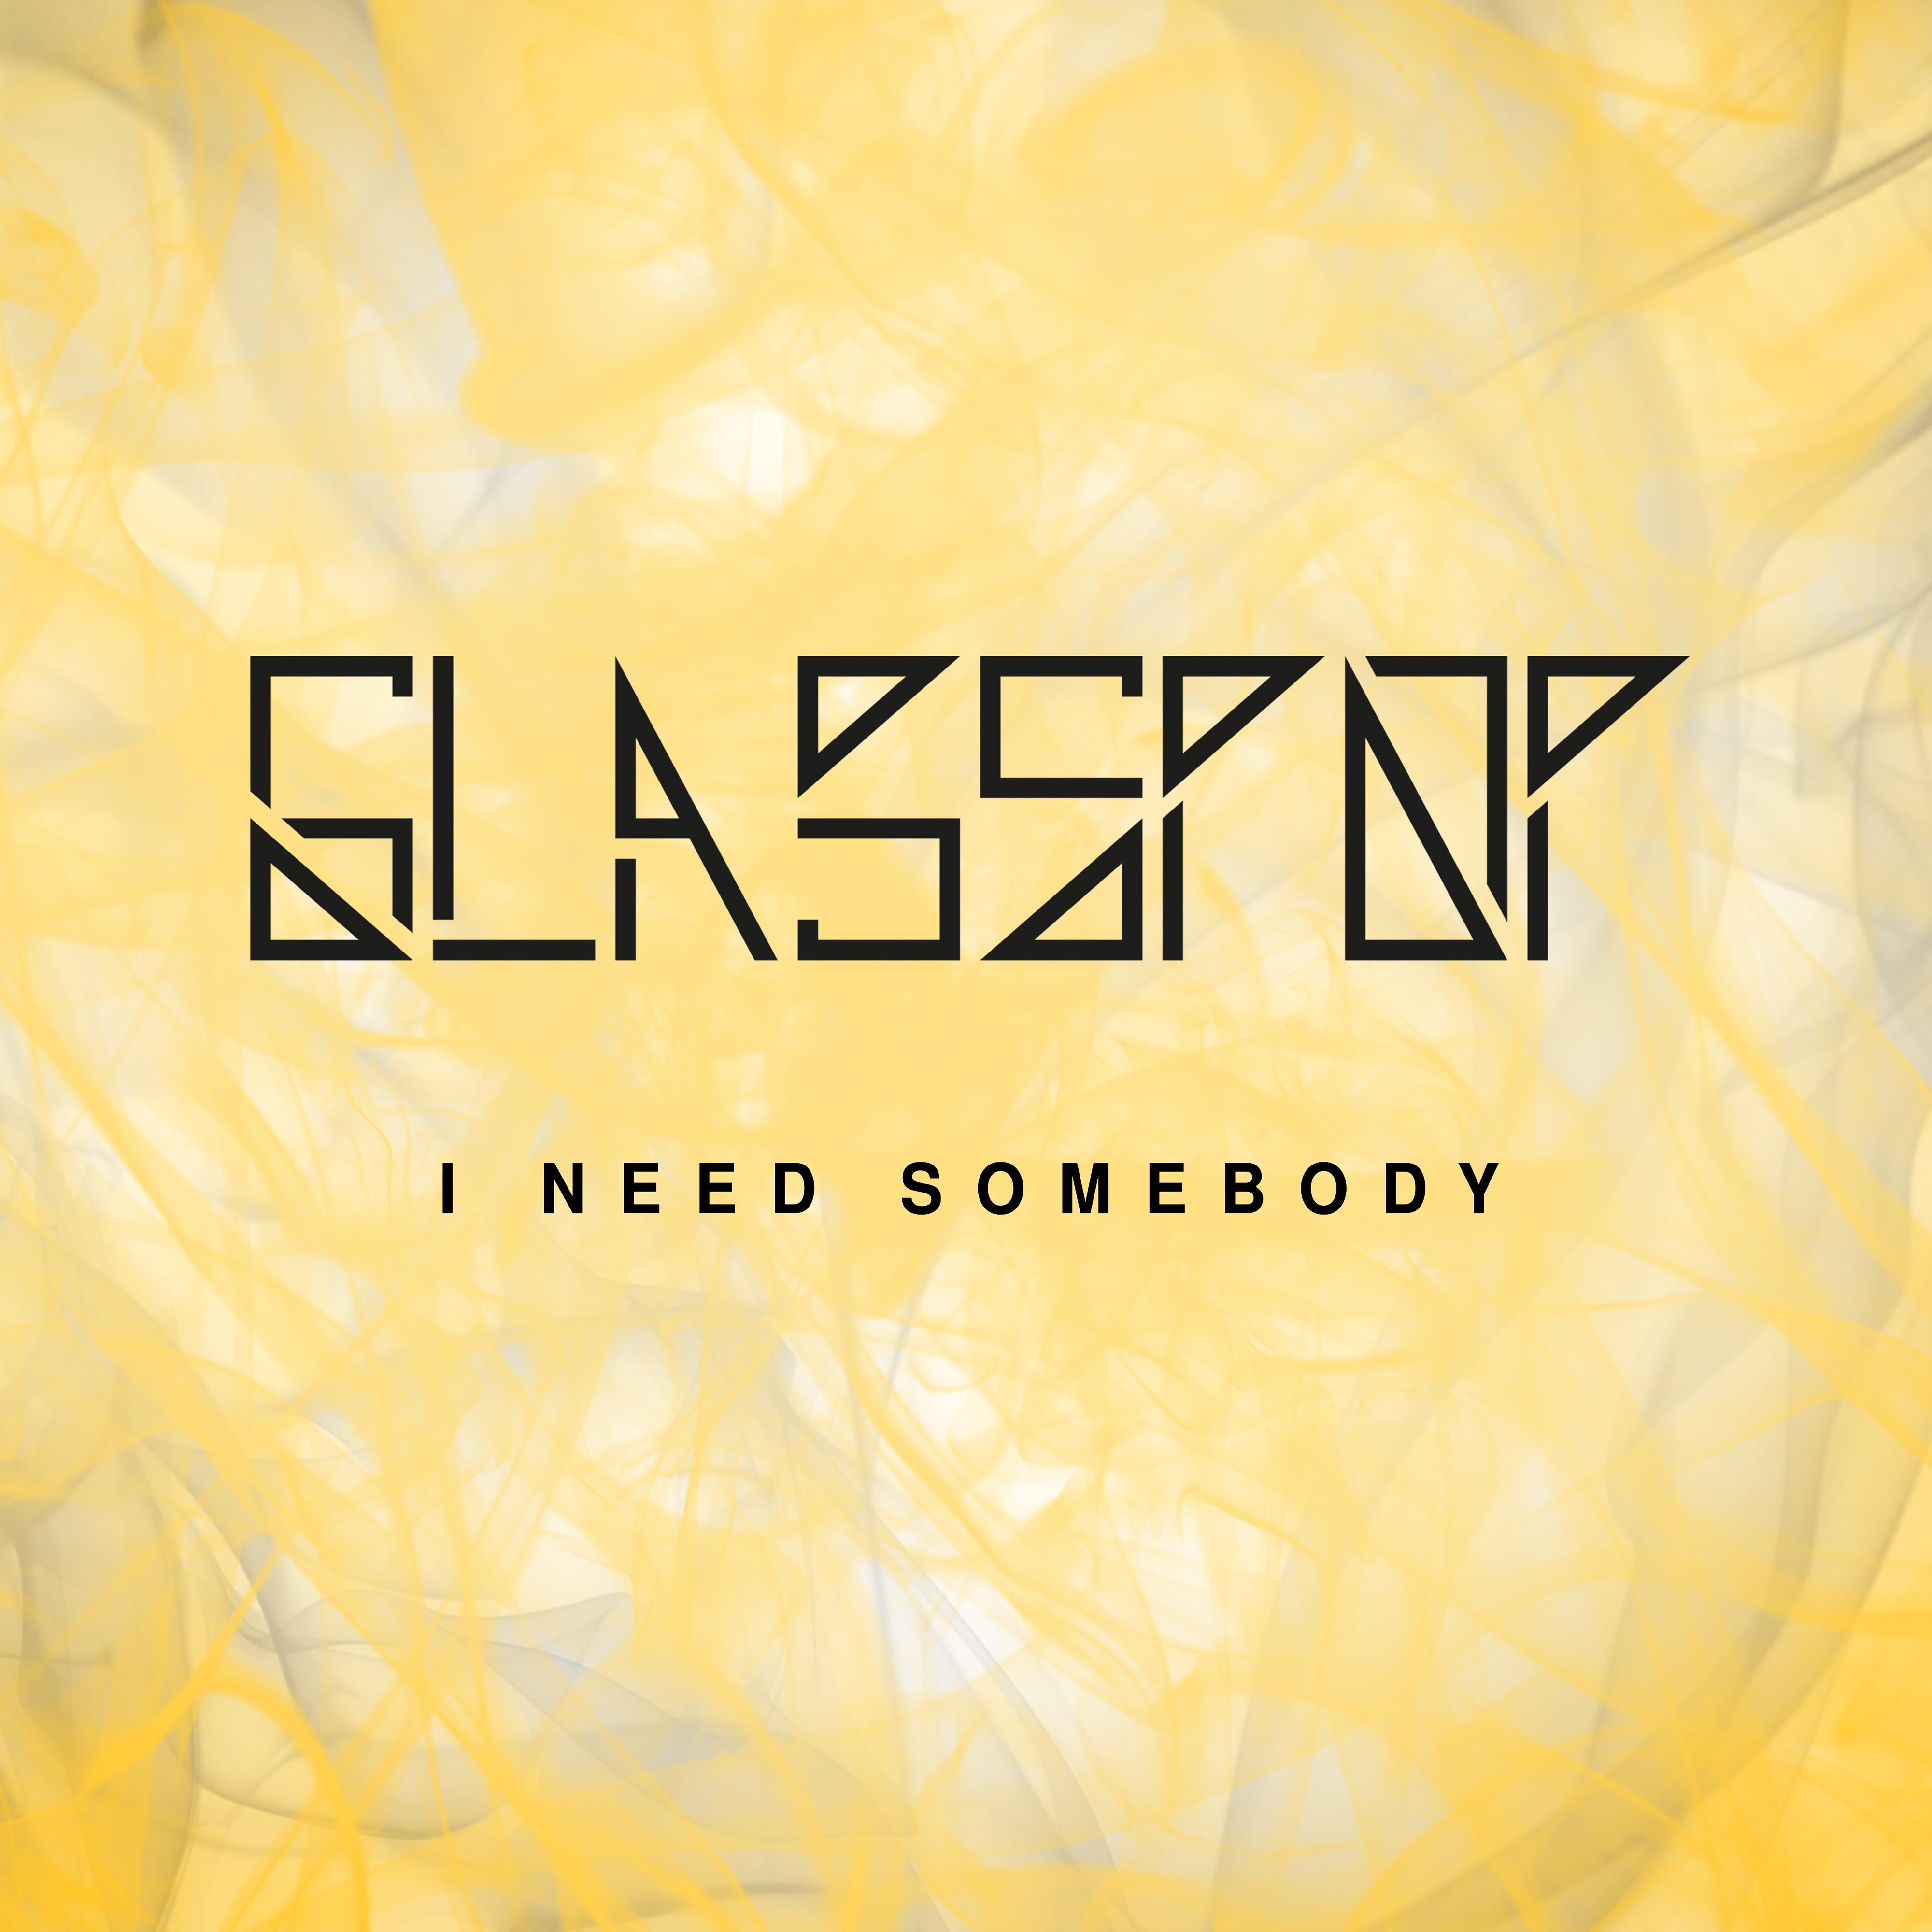 I Need somebody single release artwork rock band Glasspop